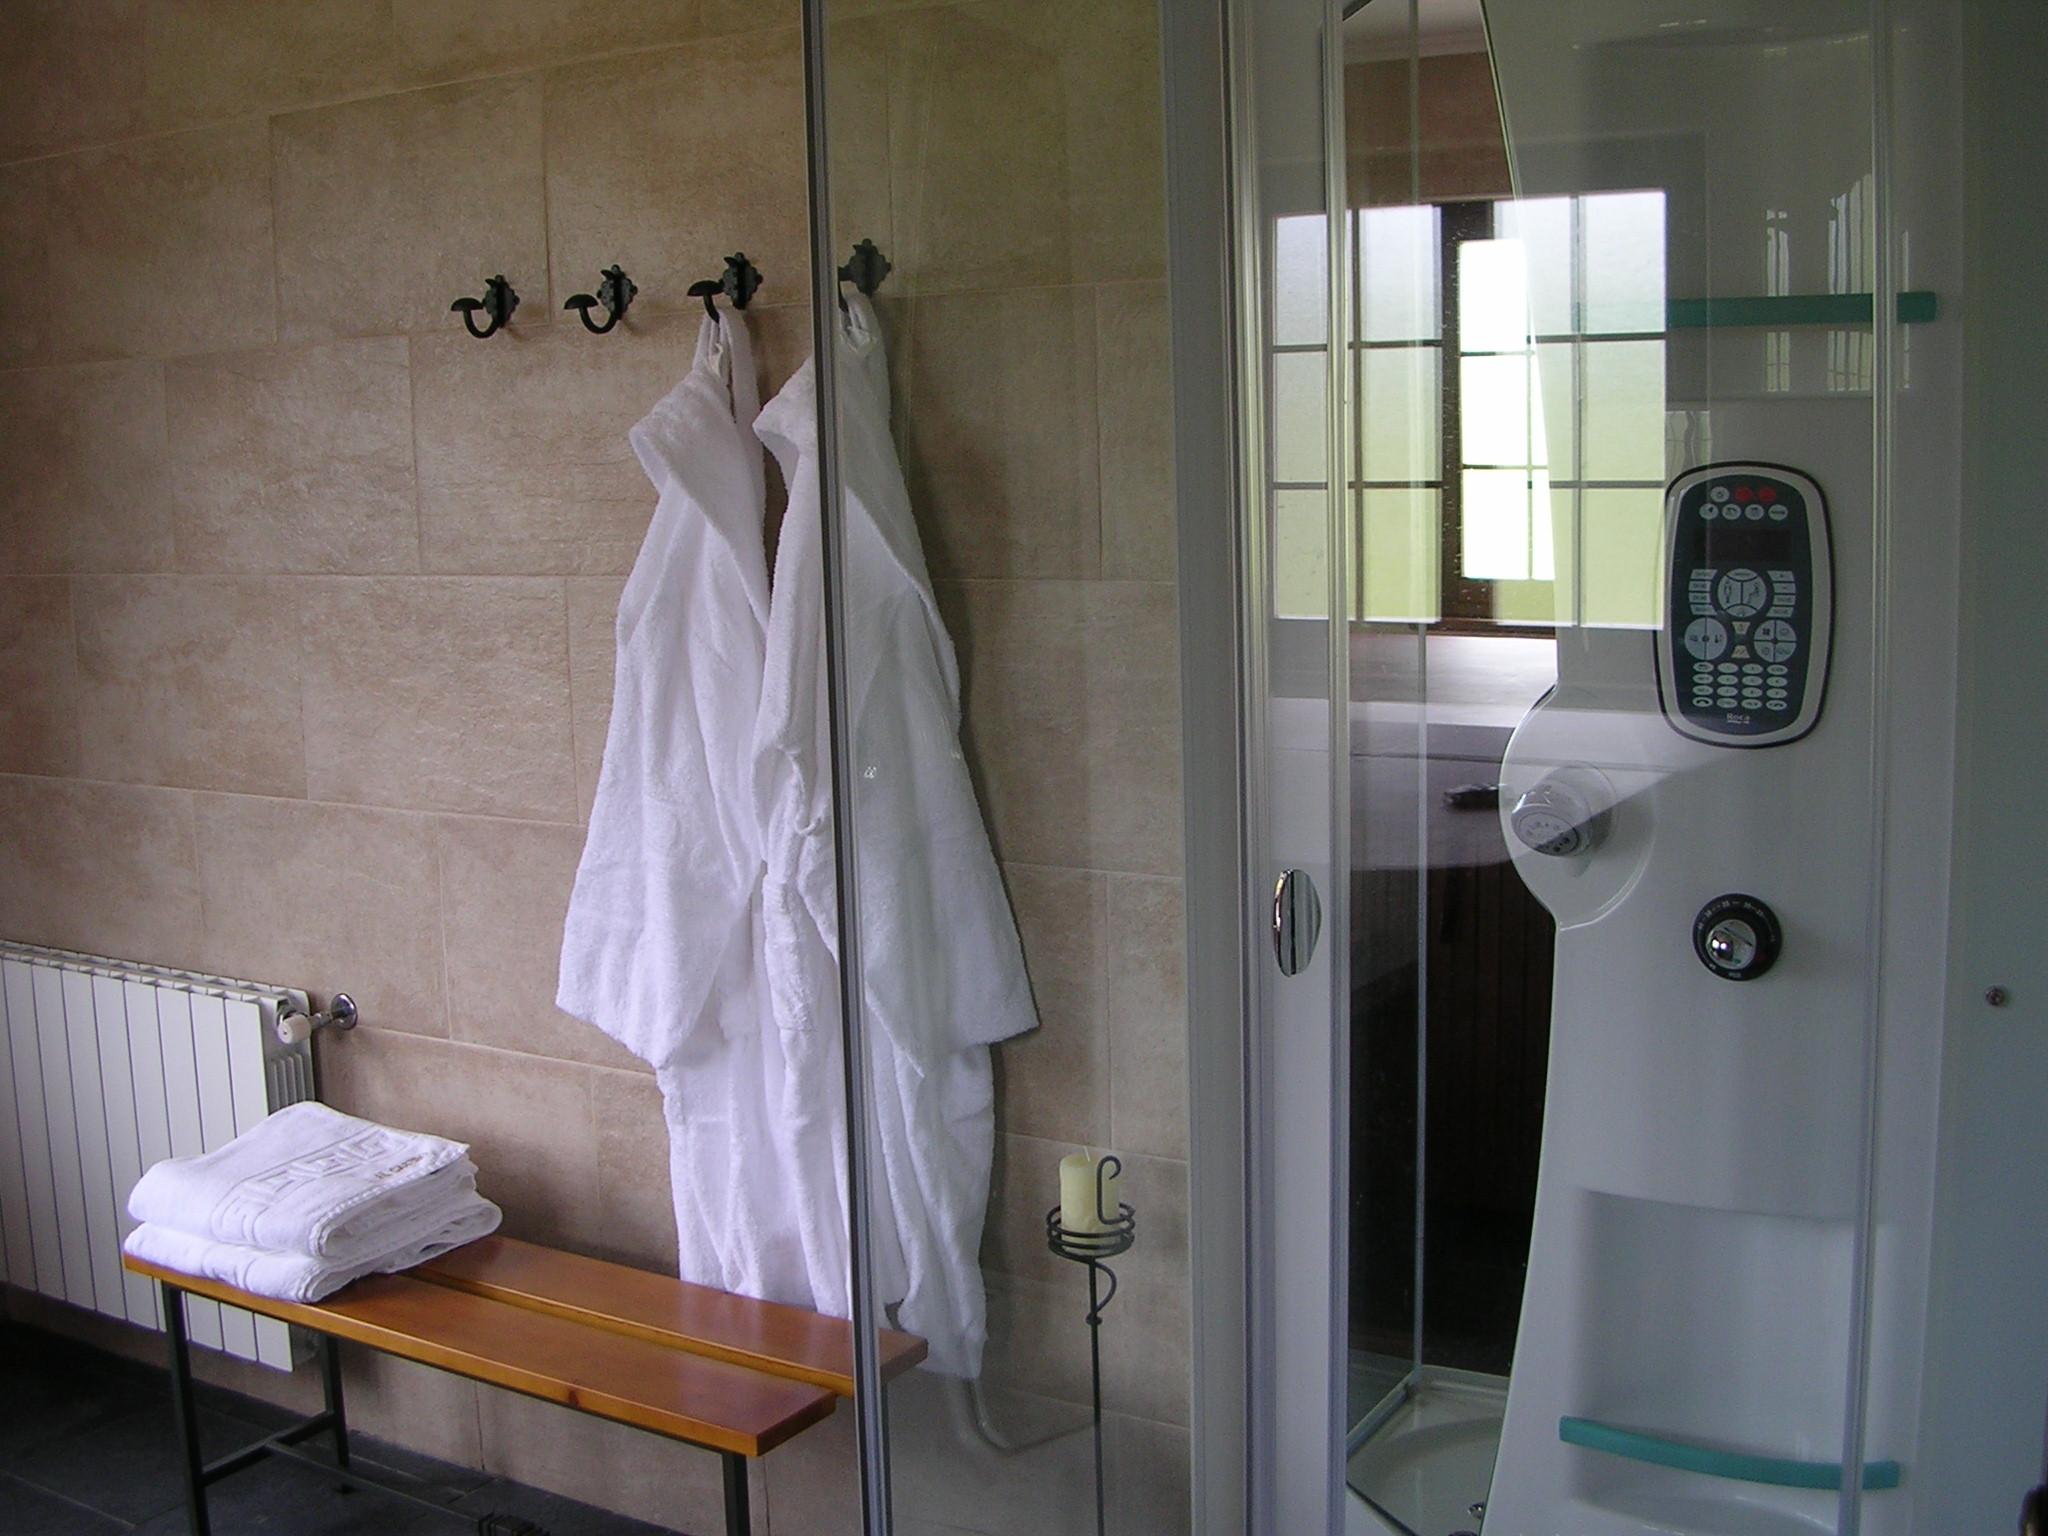 Mini spa (hidro club) 2 (1)